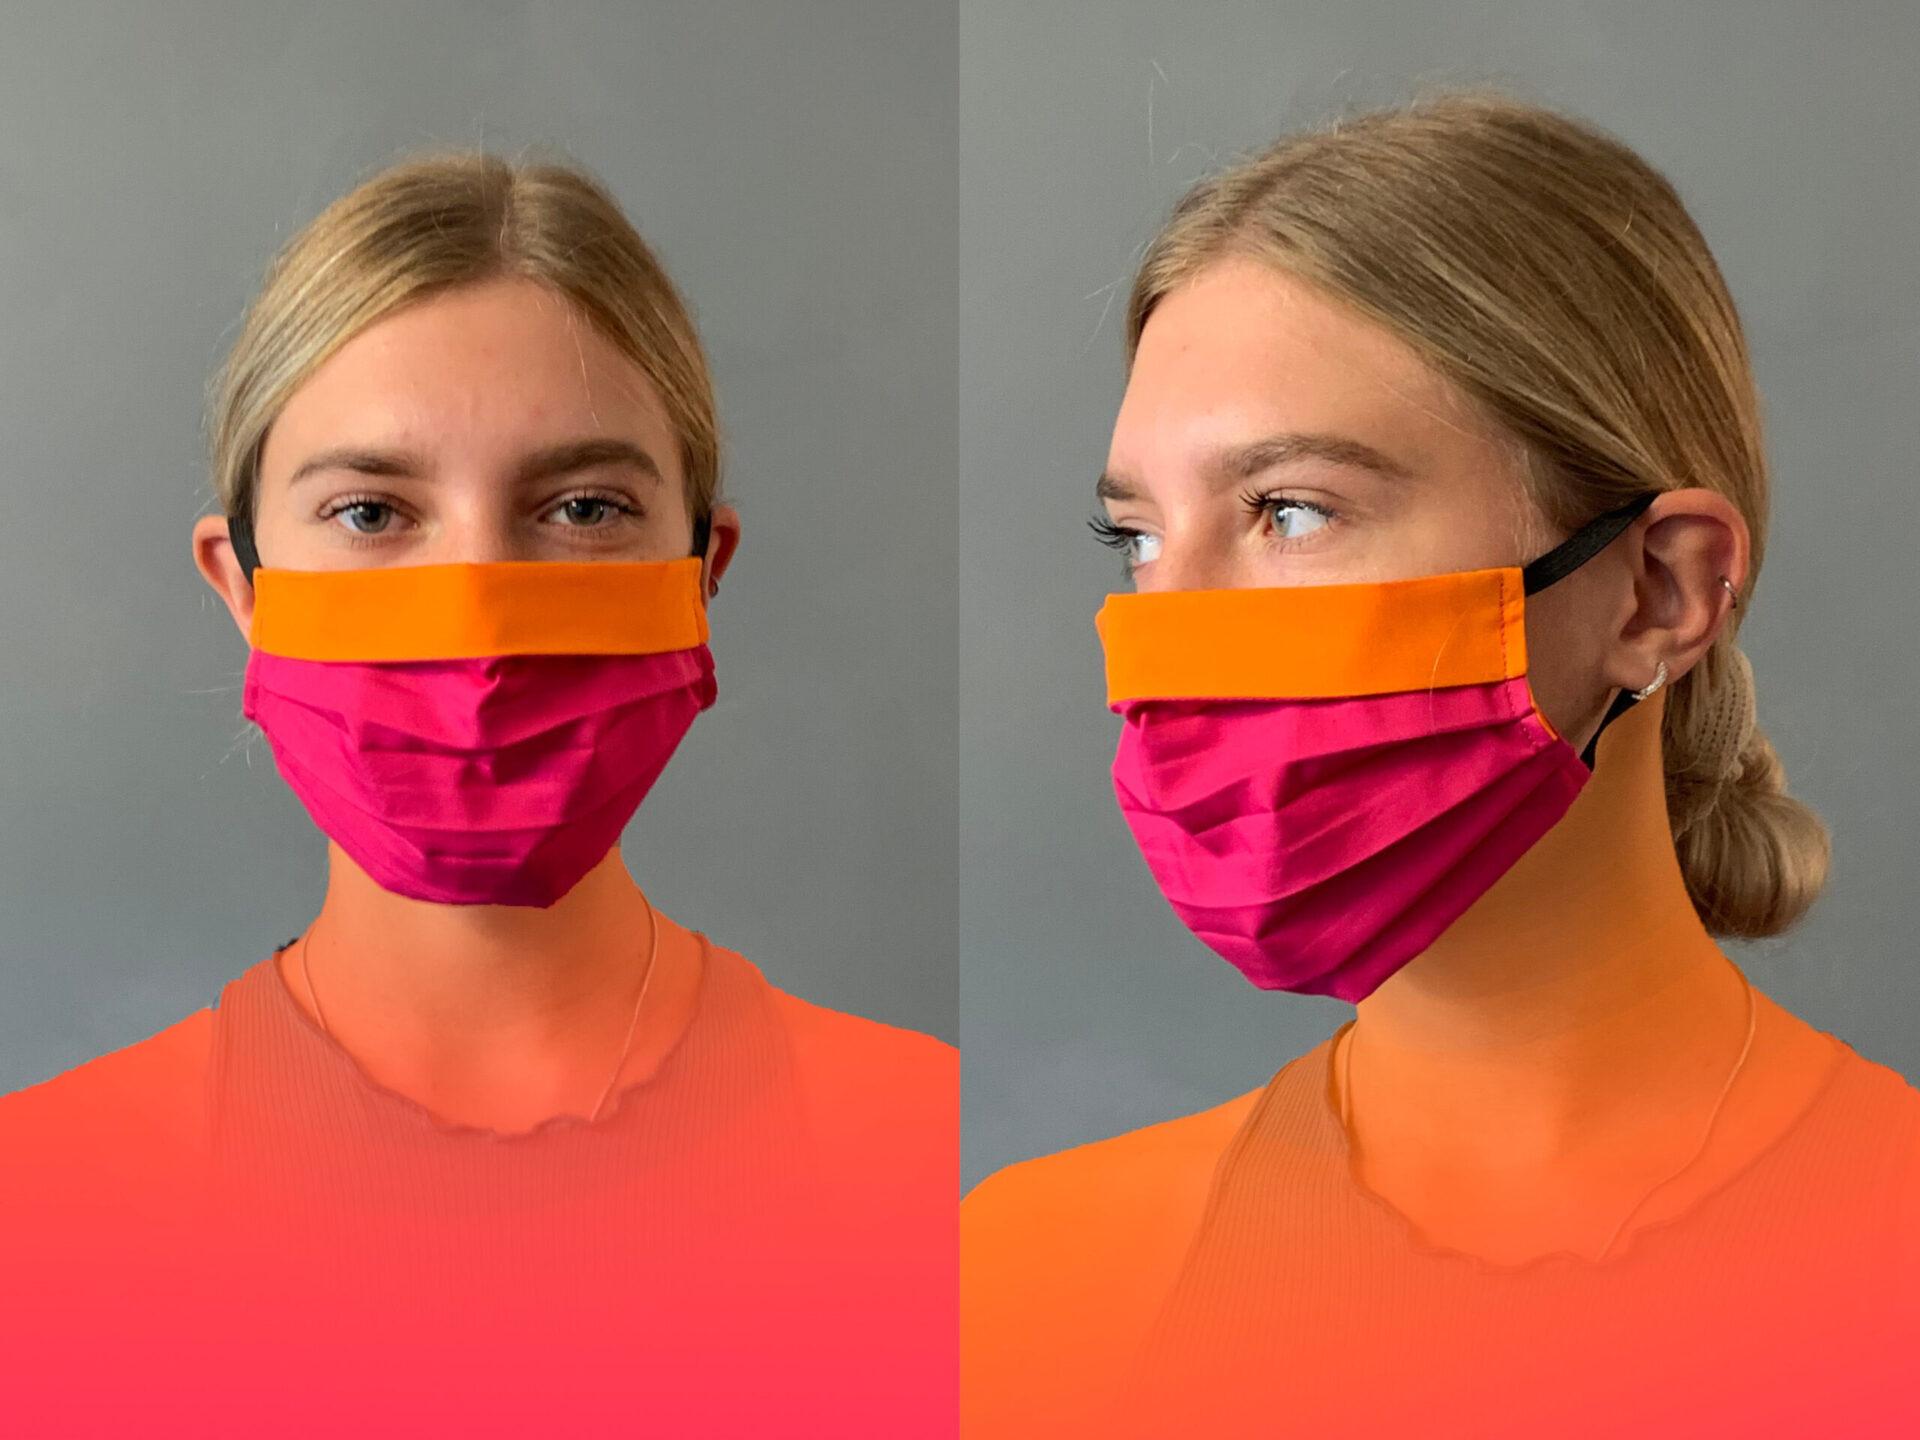 Lancashire Teaching Hospitals Charity Mask